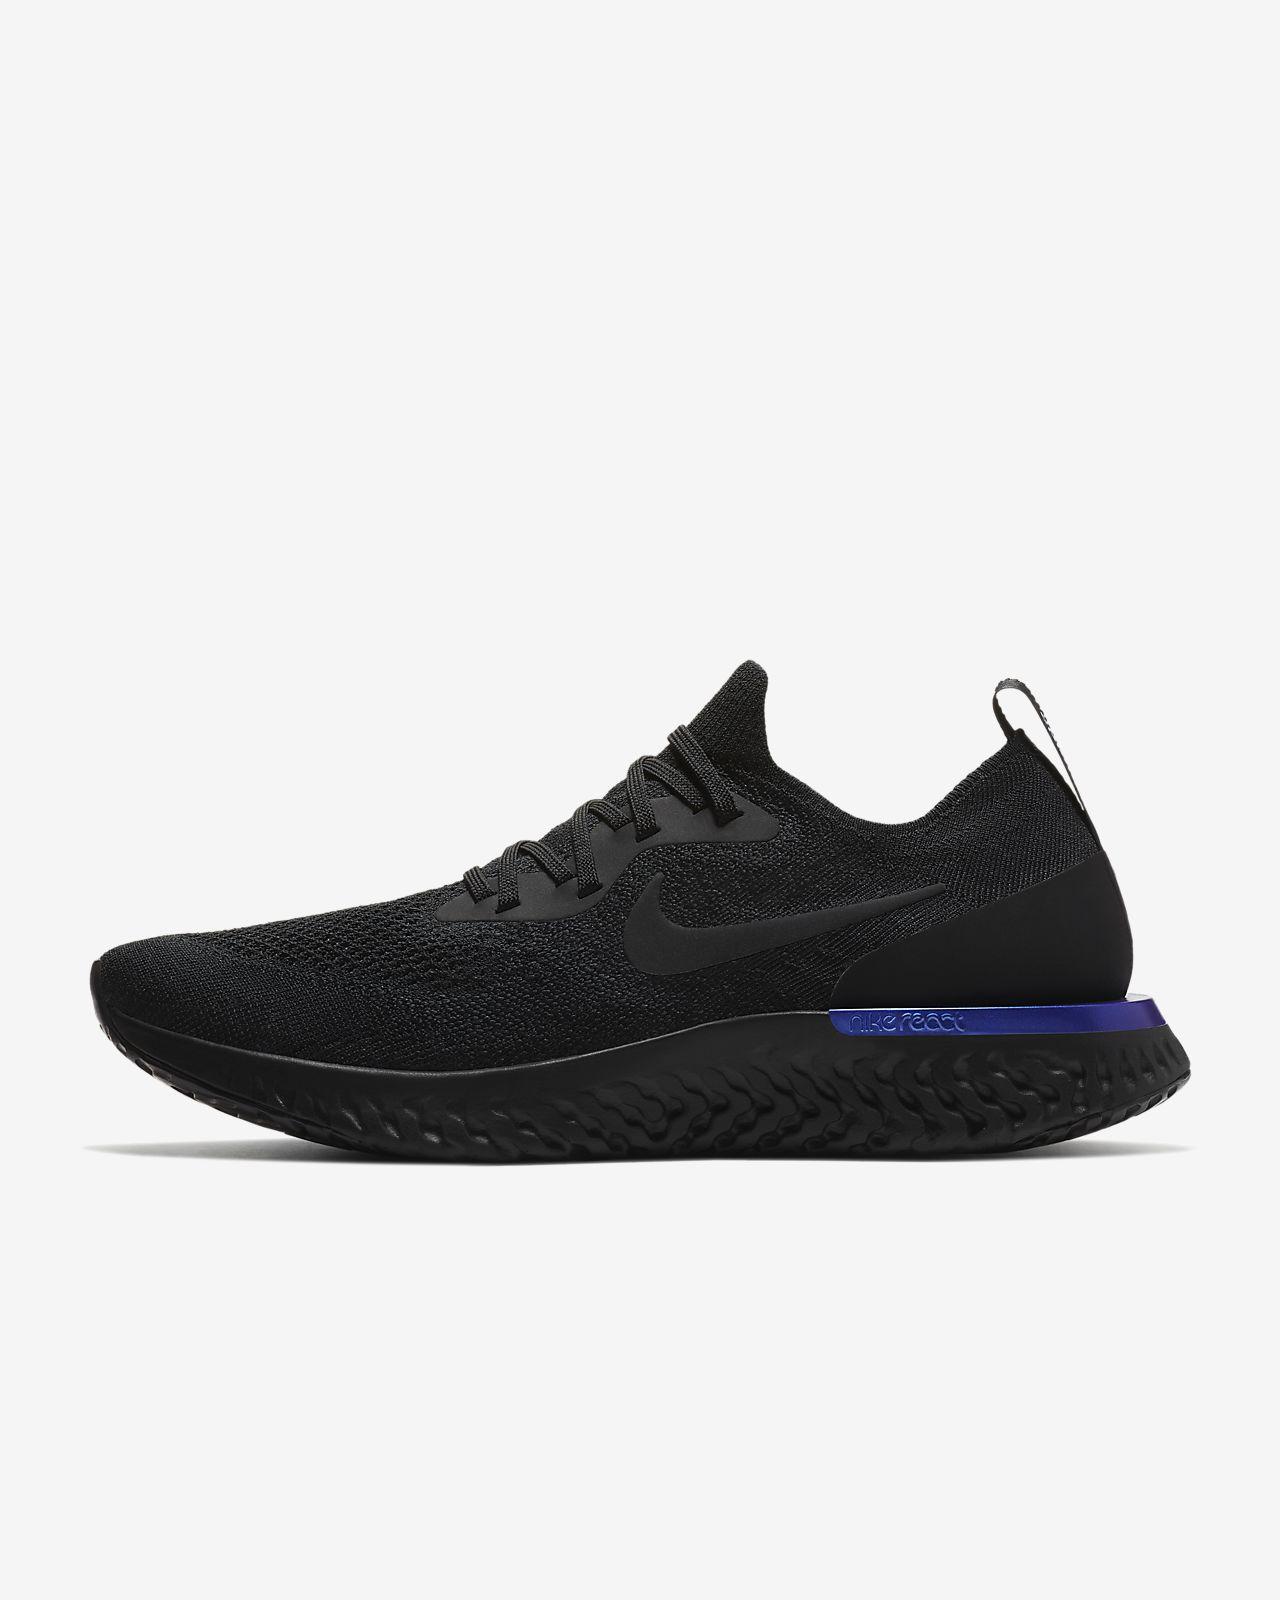 Mens Women Nike Epic React Flyknit Black AU Blue Running Shoes AQ0067-004